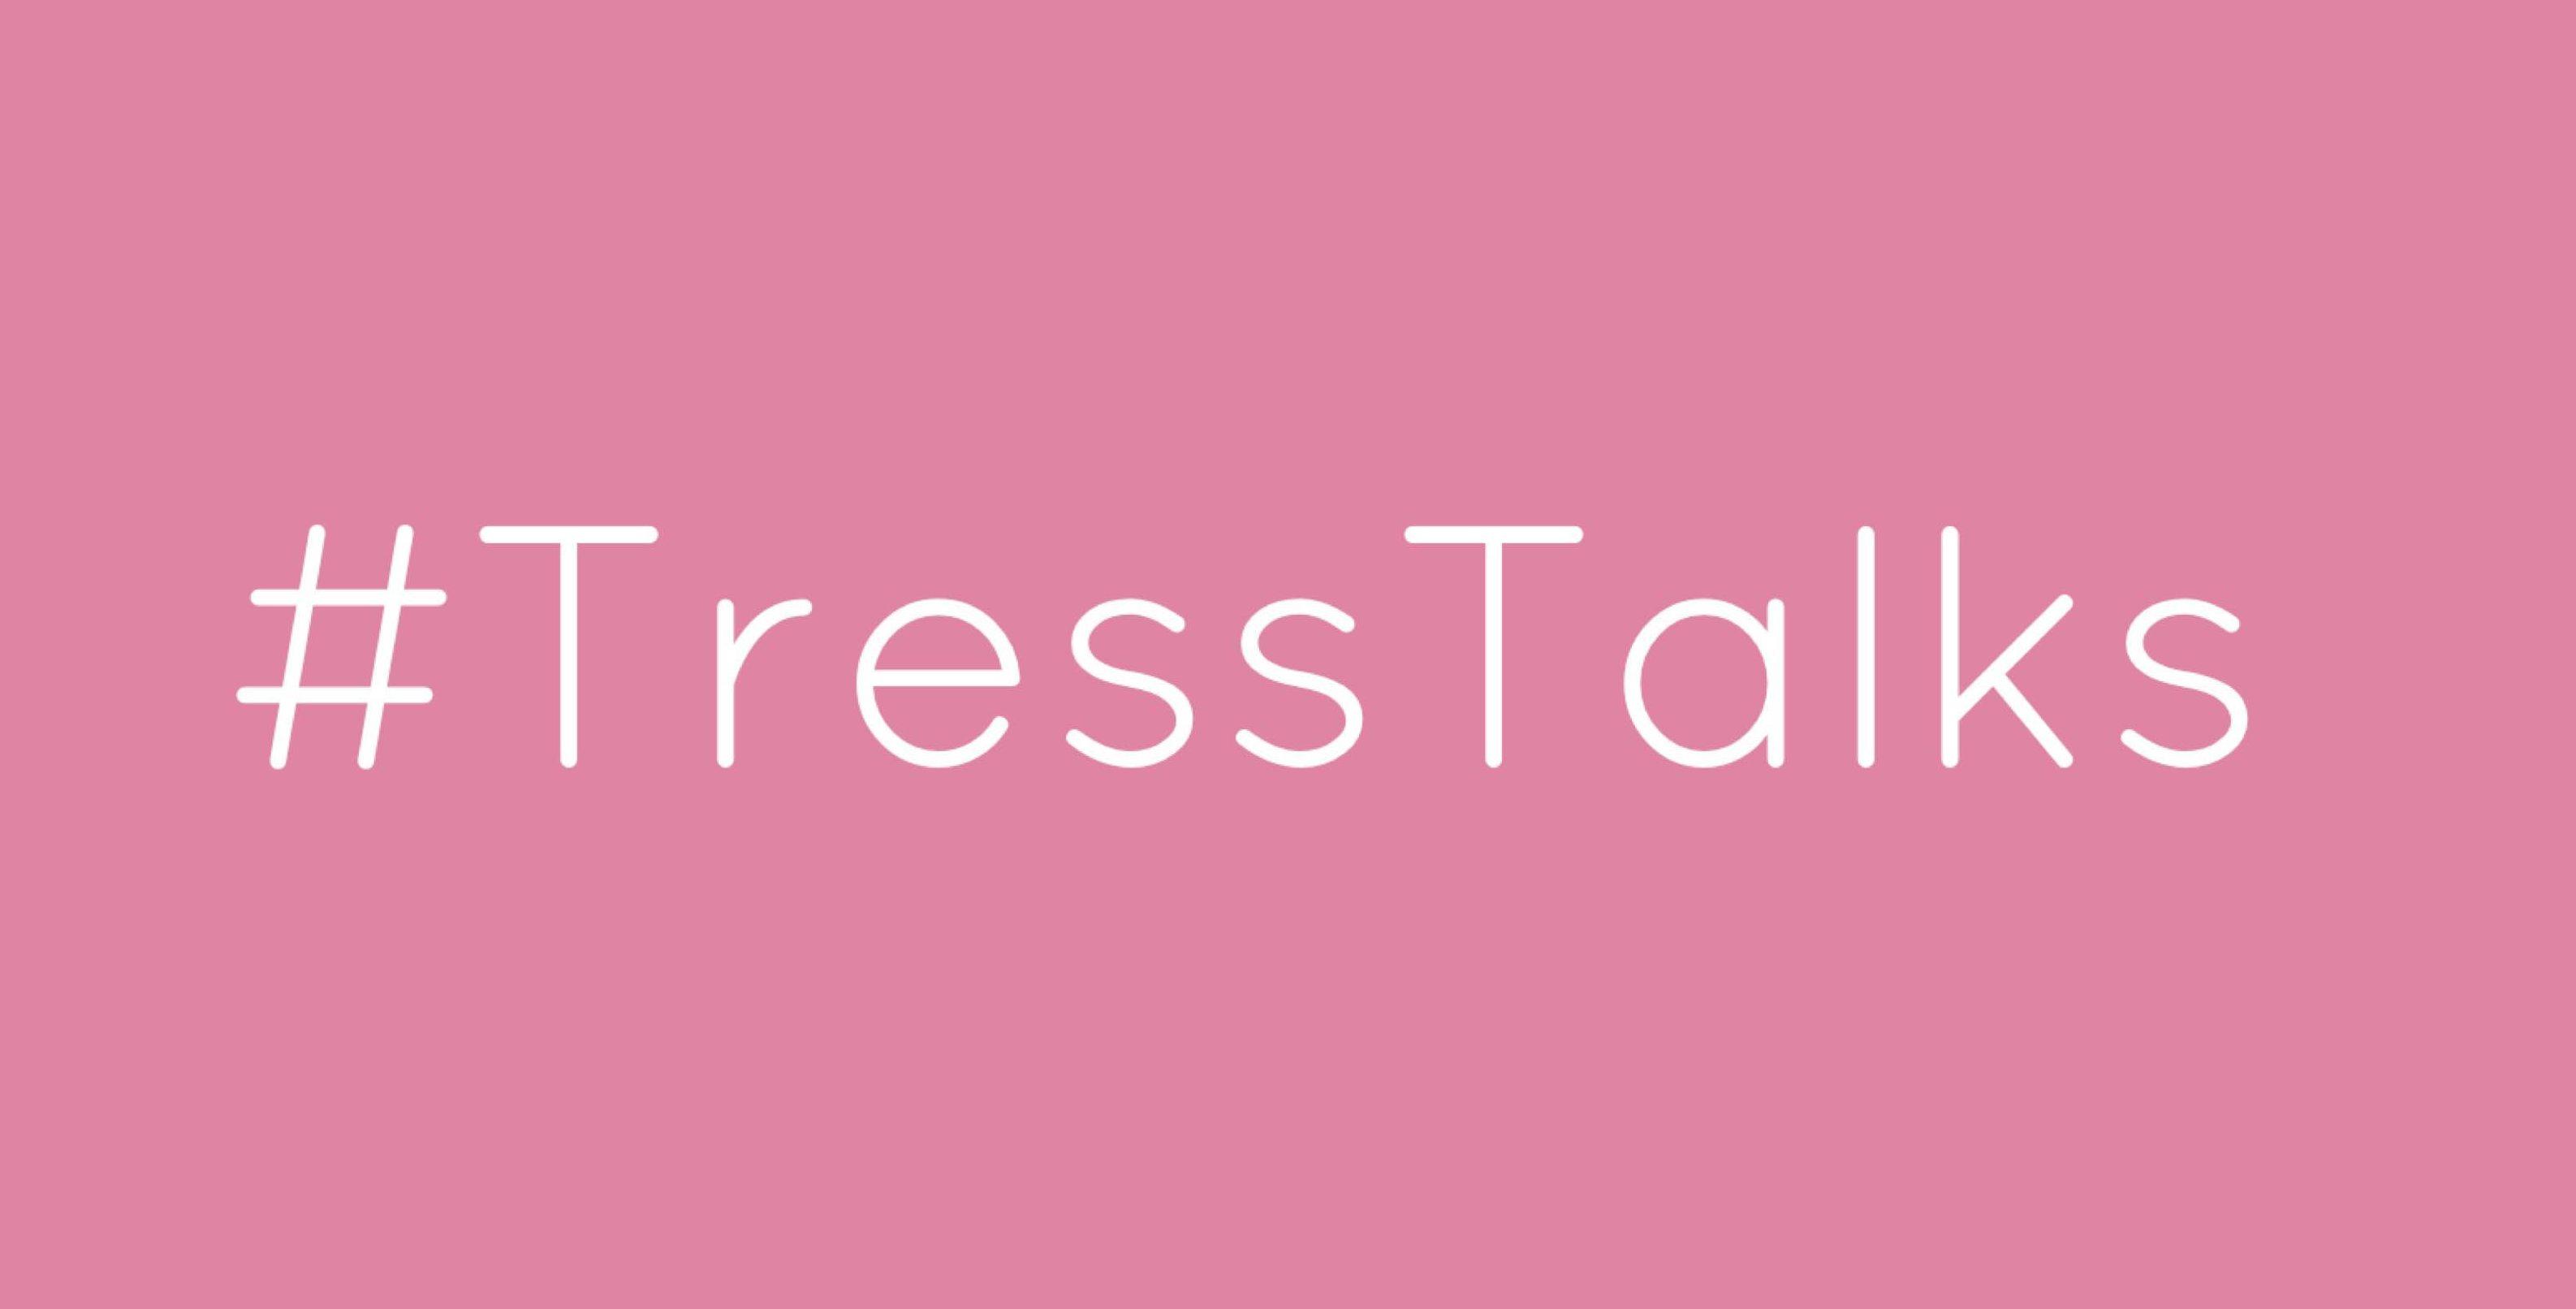 #TressTalks